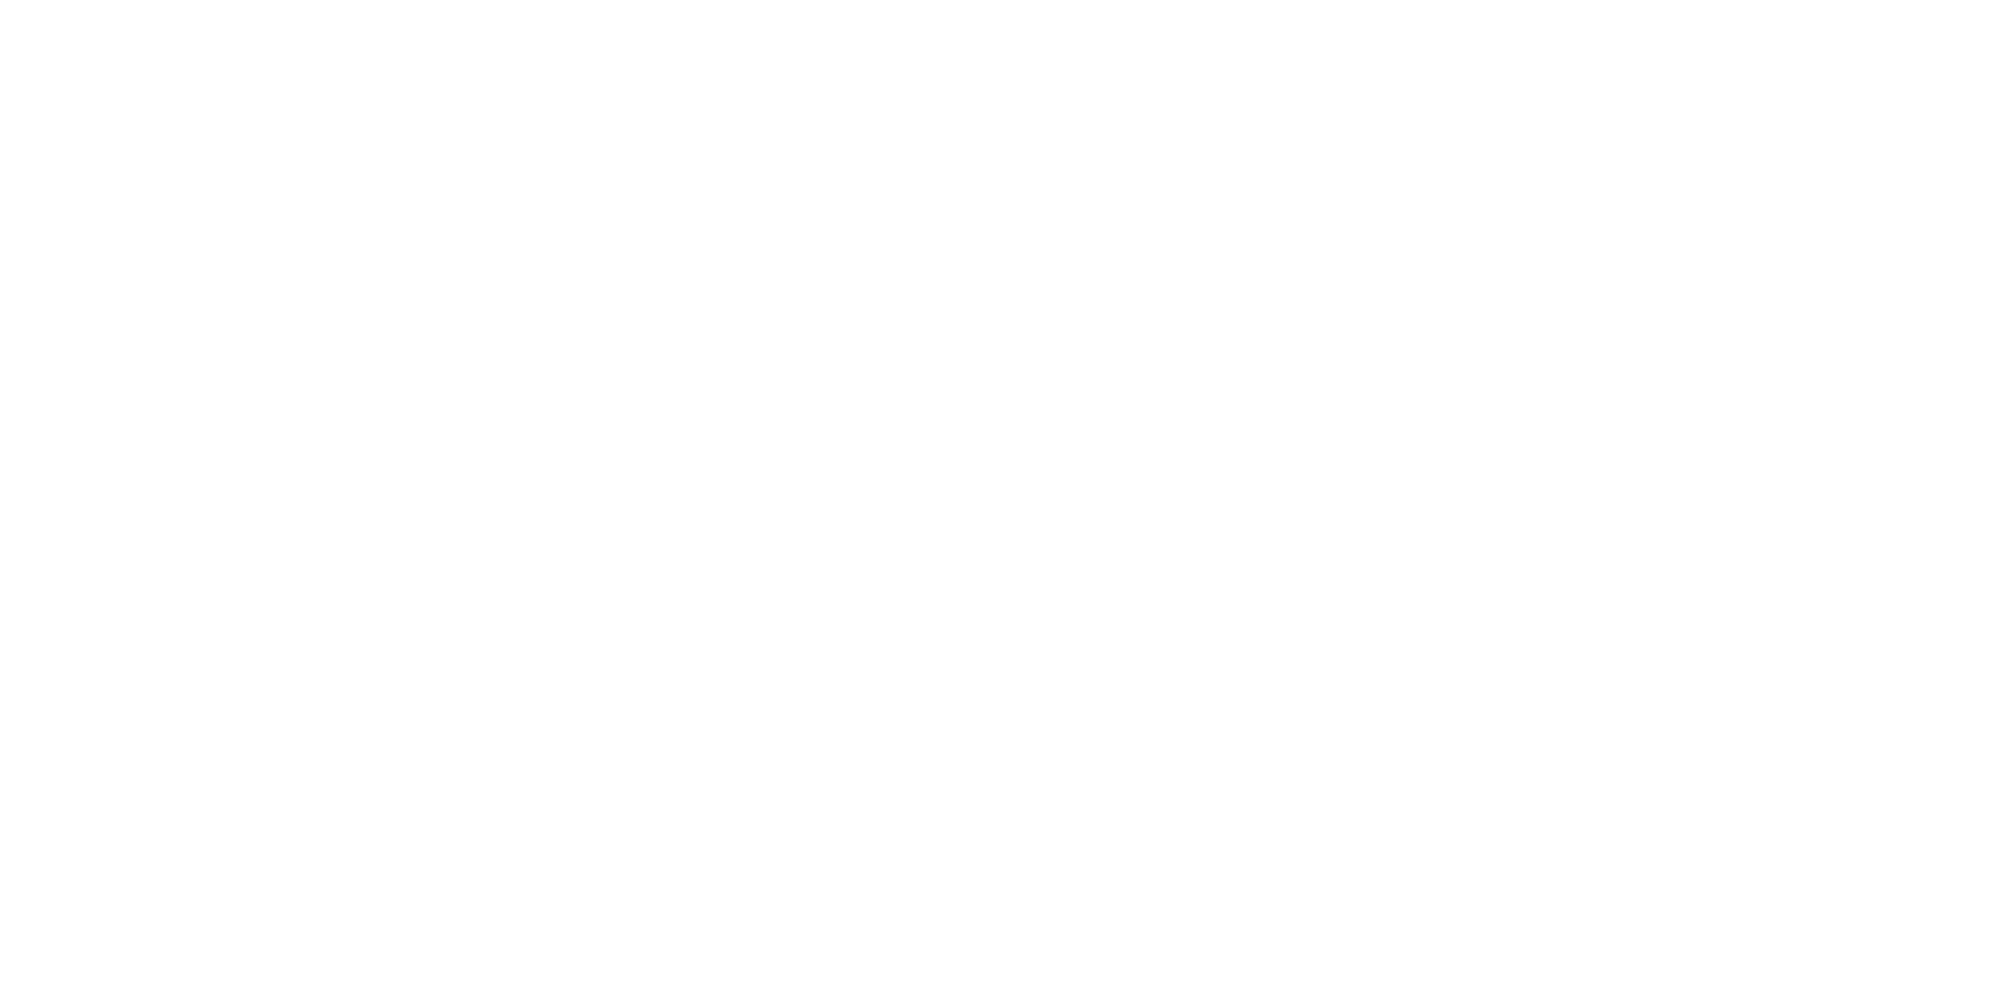 شرکت آراک صنعت